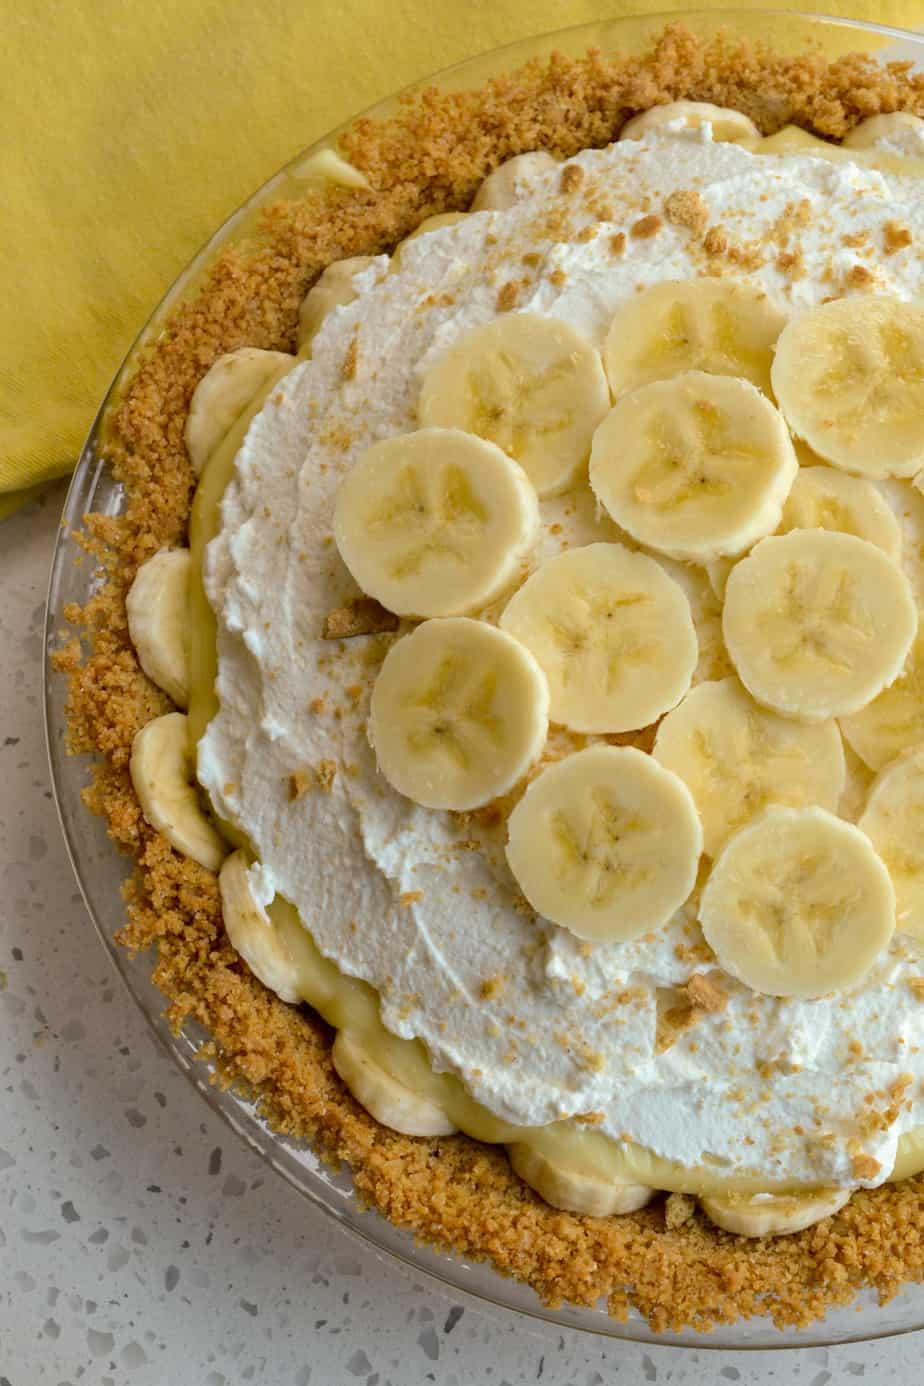 Creamy banana cream pie with a graham cracker crust and homemade vanilla pudding.